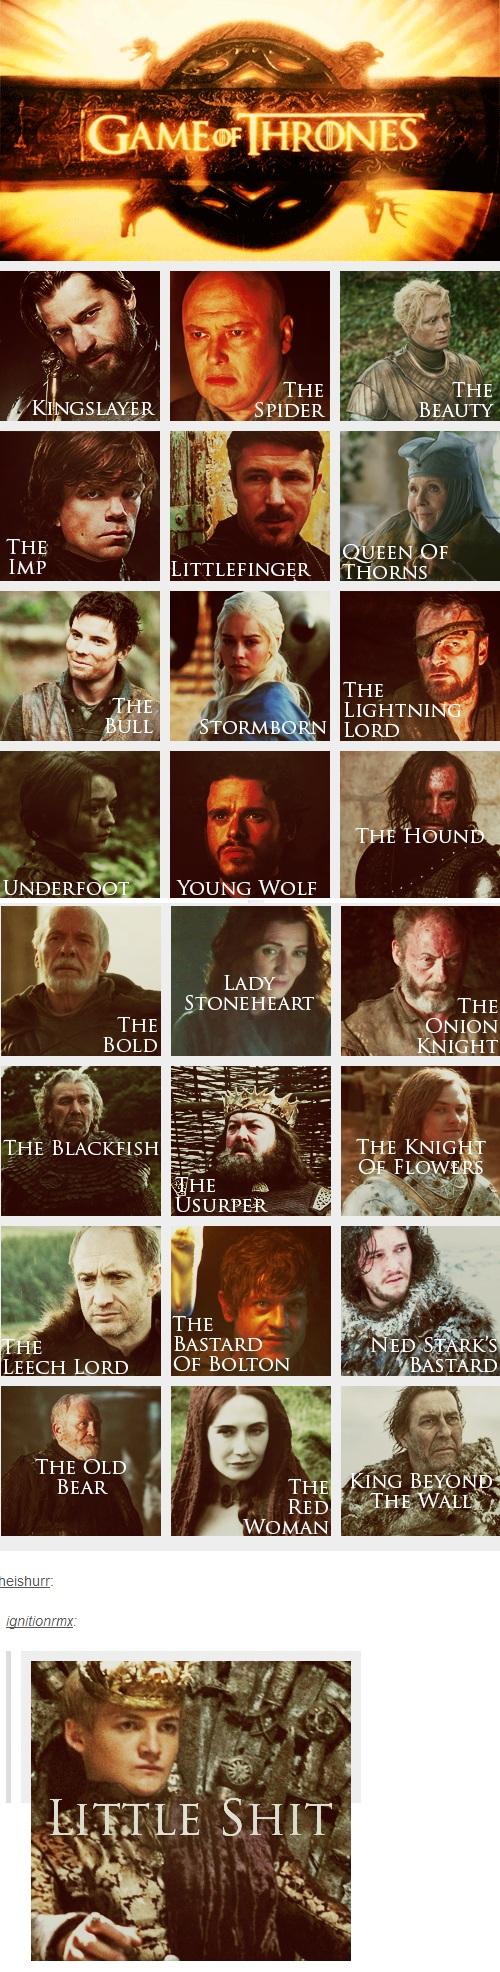 el que queda perfecto es el ultimo jajajaja (gif) Game of Thrones Titles #got #agot #asoiaf